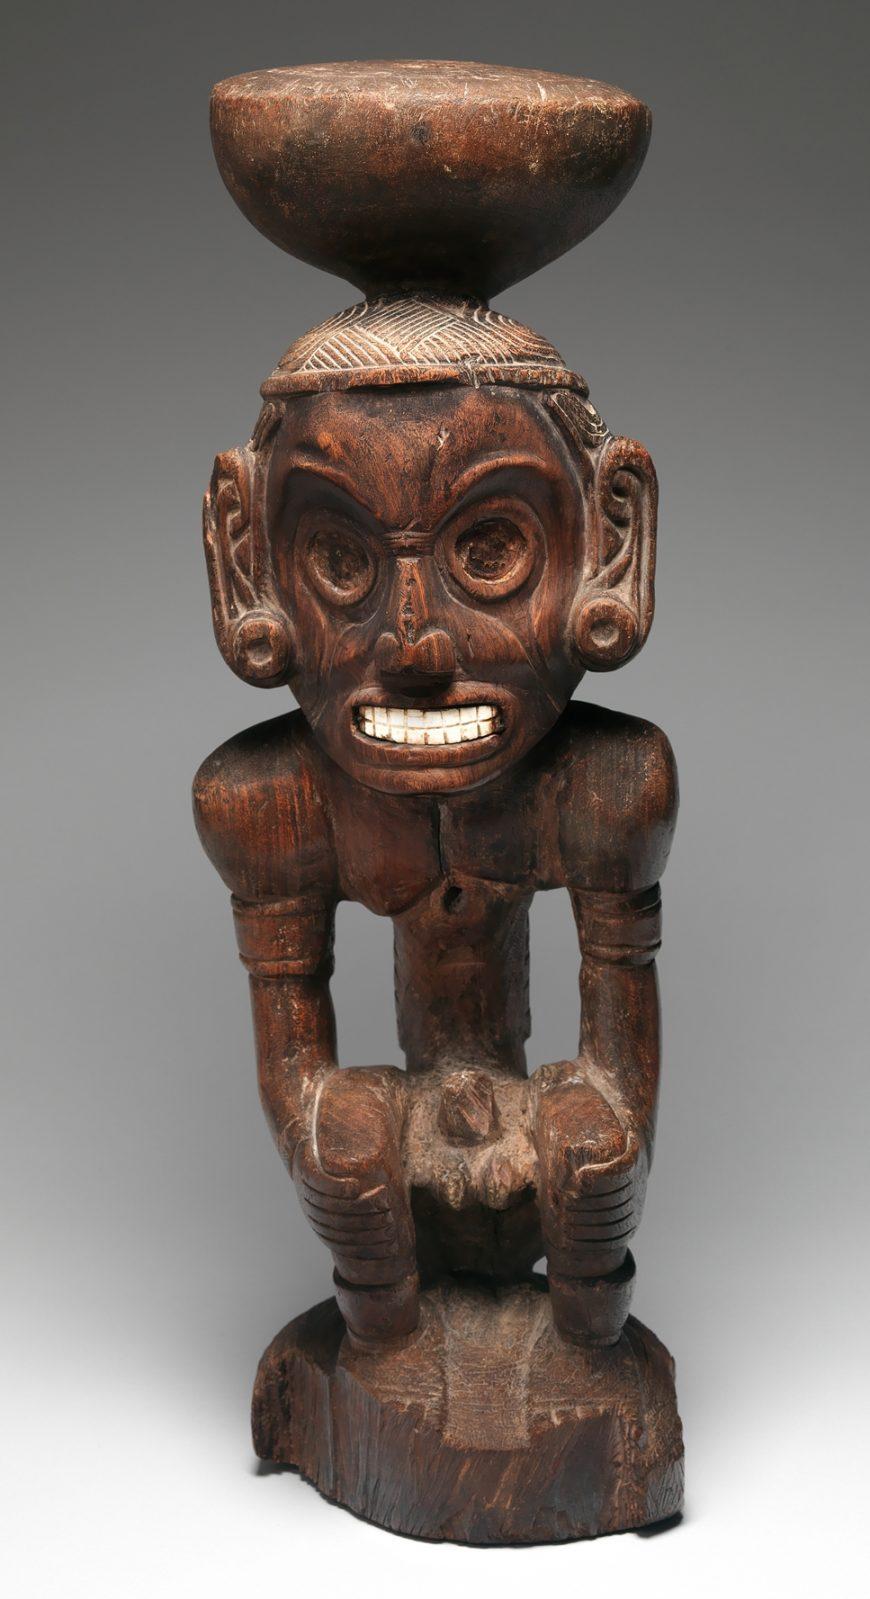 Deity Figure (Zemi), c. 1000, Dominican Republic, wood, shell, 68.5 x 21.9 x 23.2 cm (The Metropolitan Museum of Art)